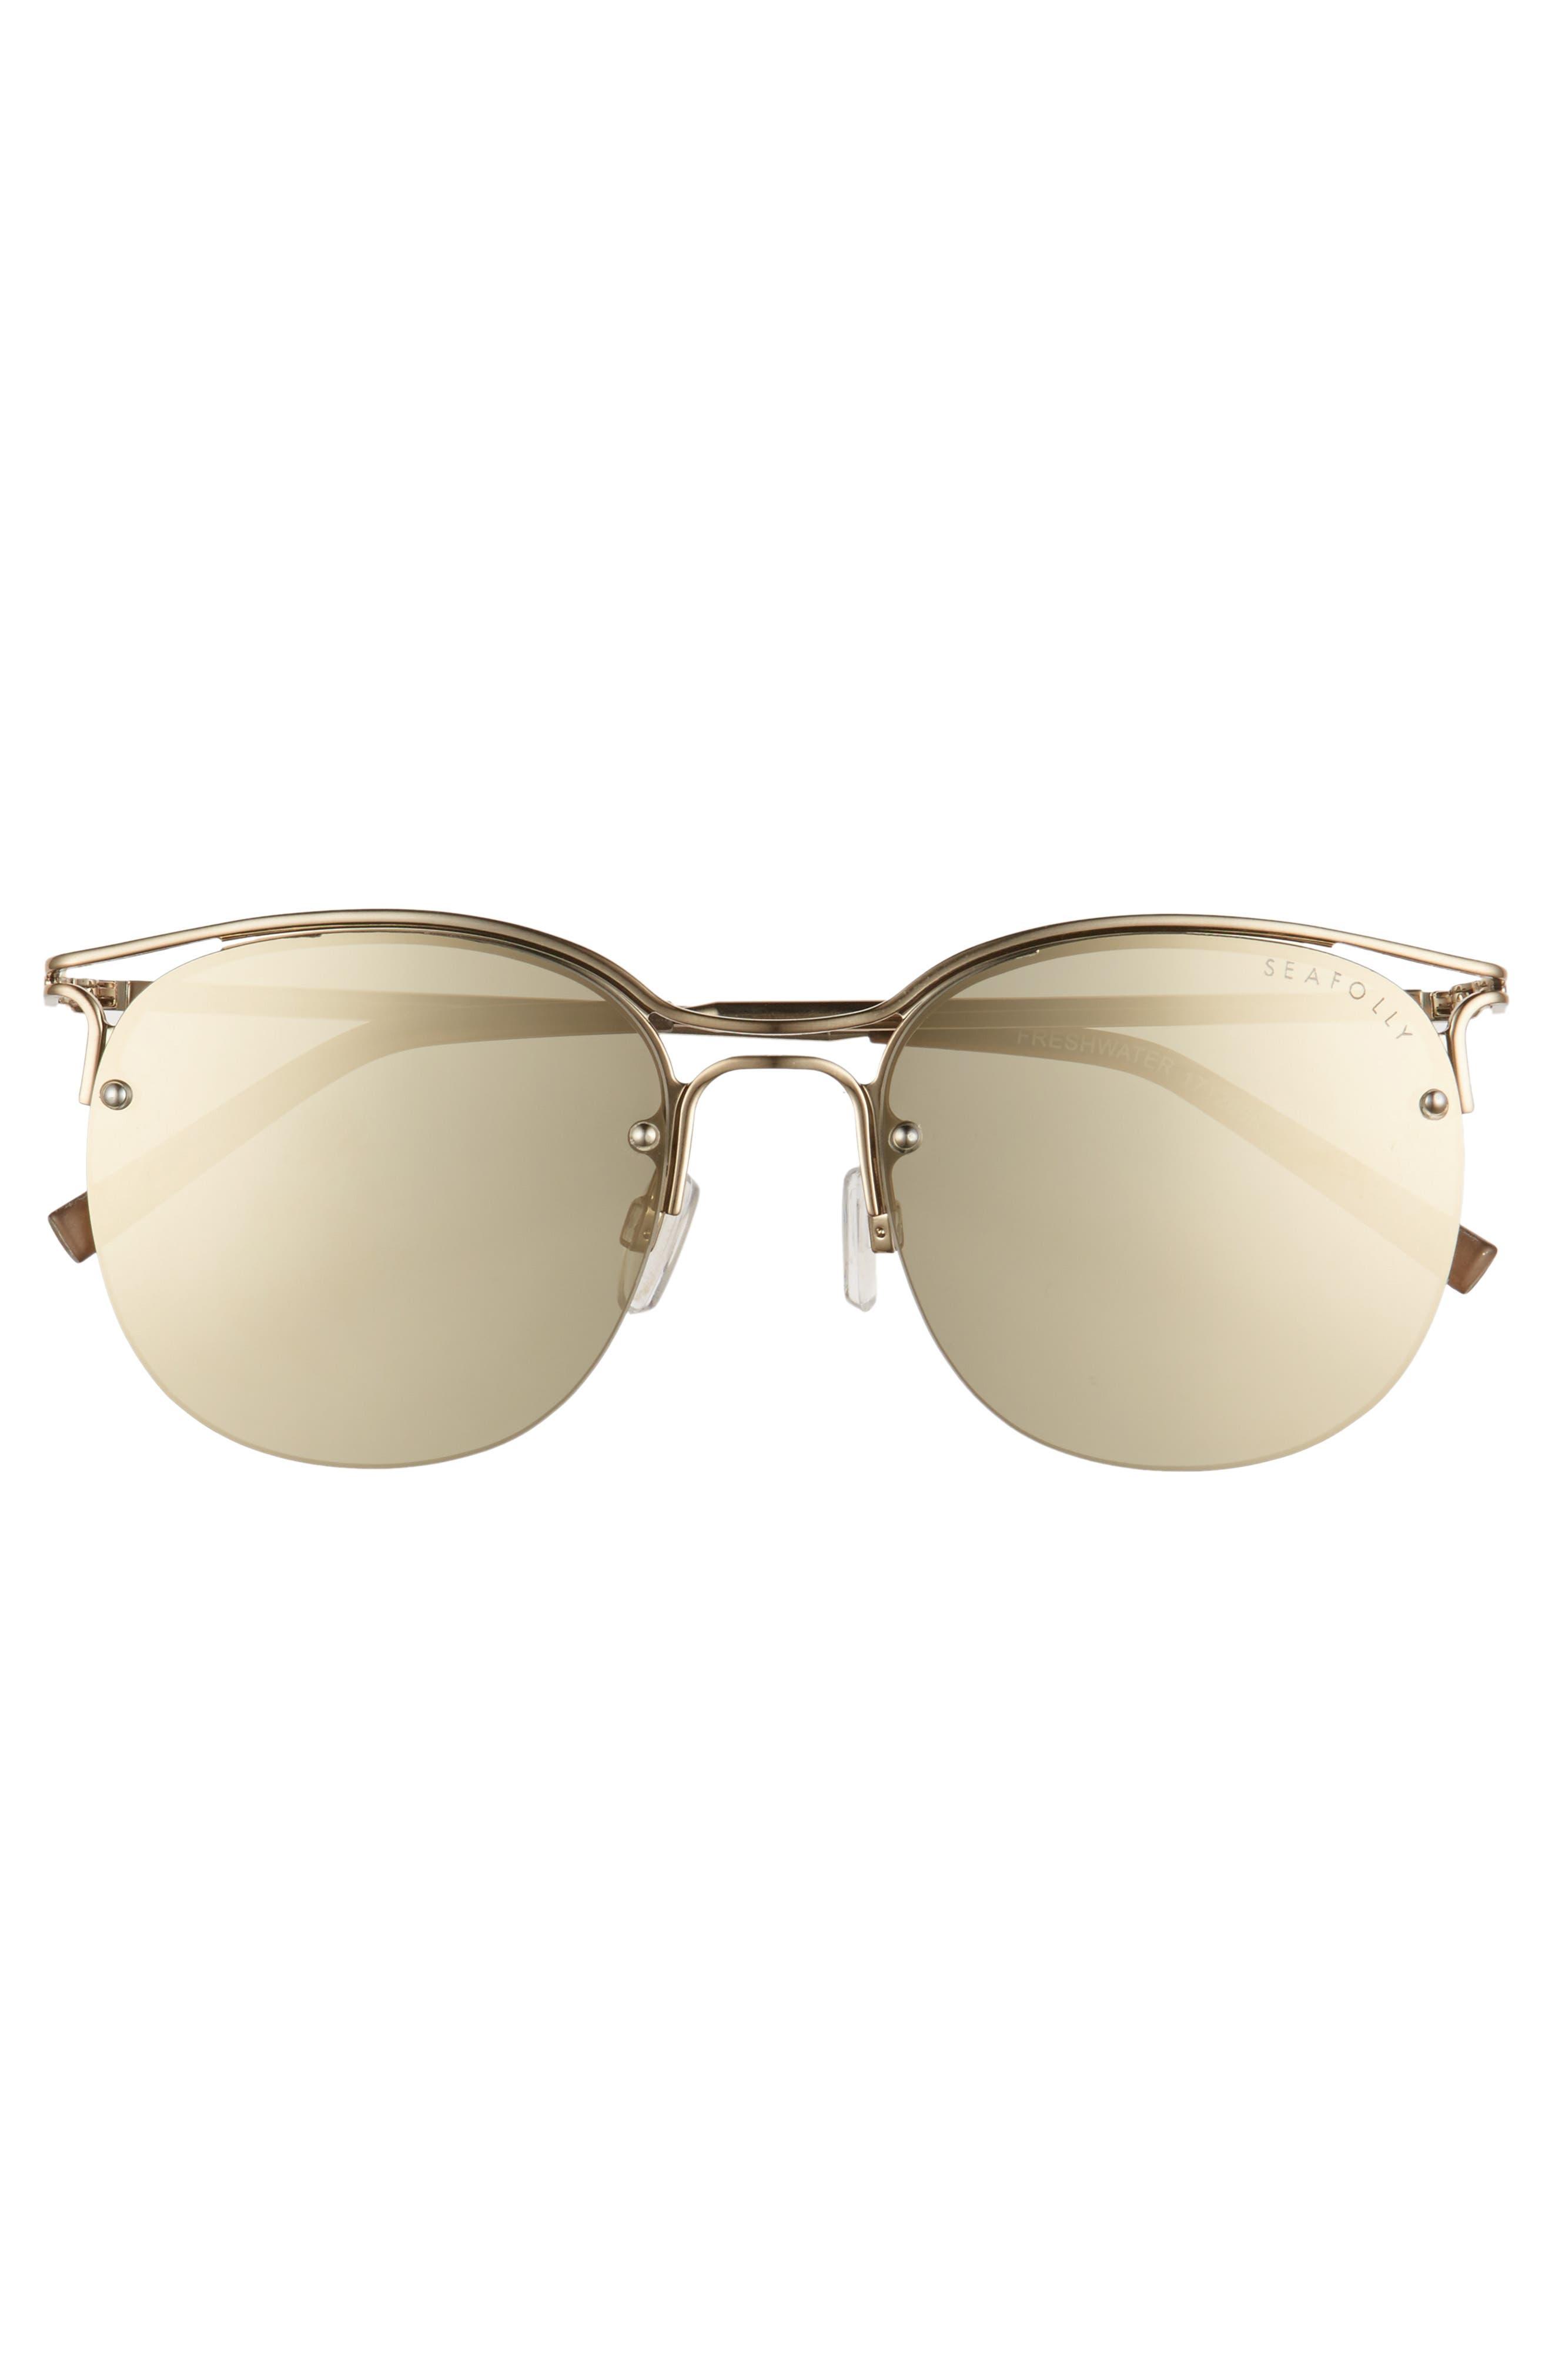 Freshwater 55m Metal Sunglasses,                             Alternate thumbnail 3, color,                             Moss